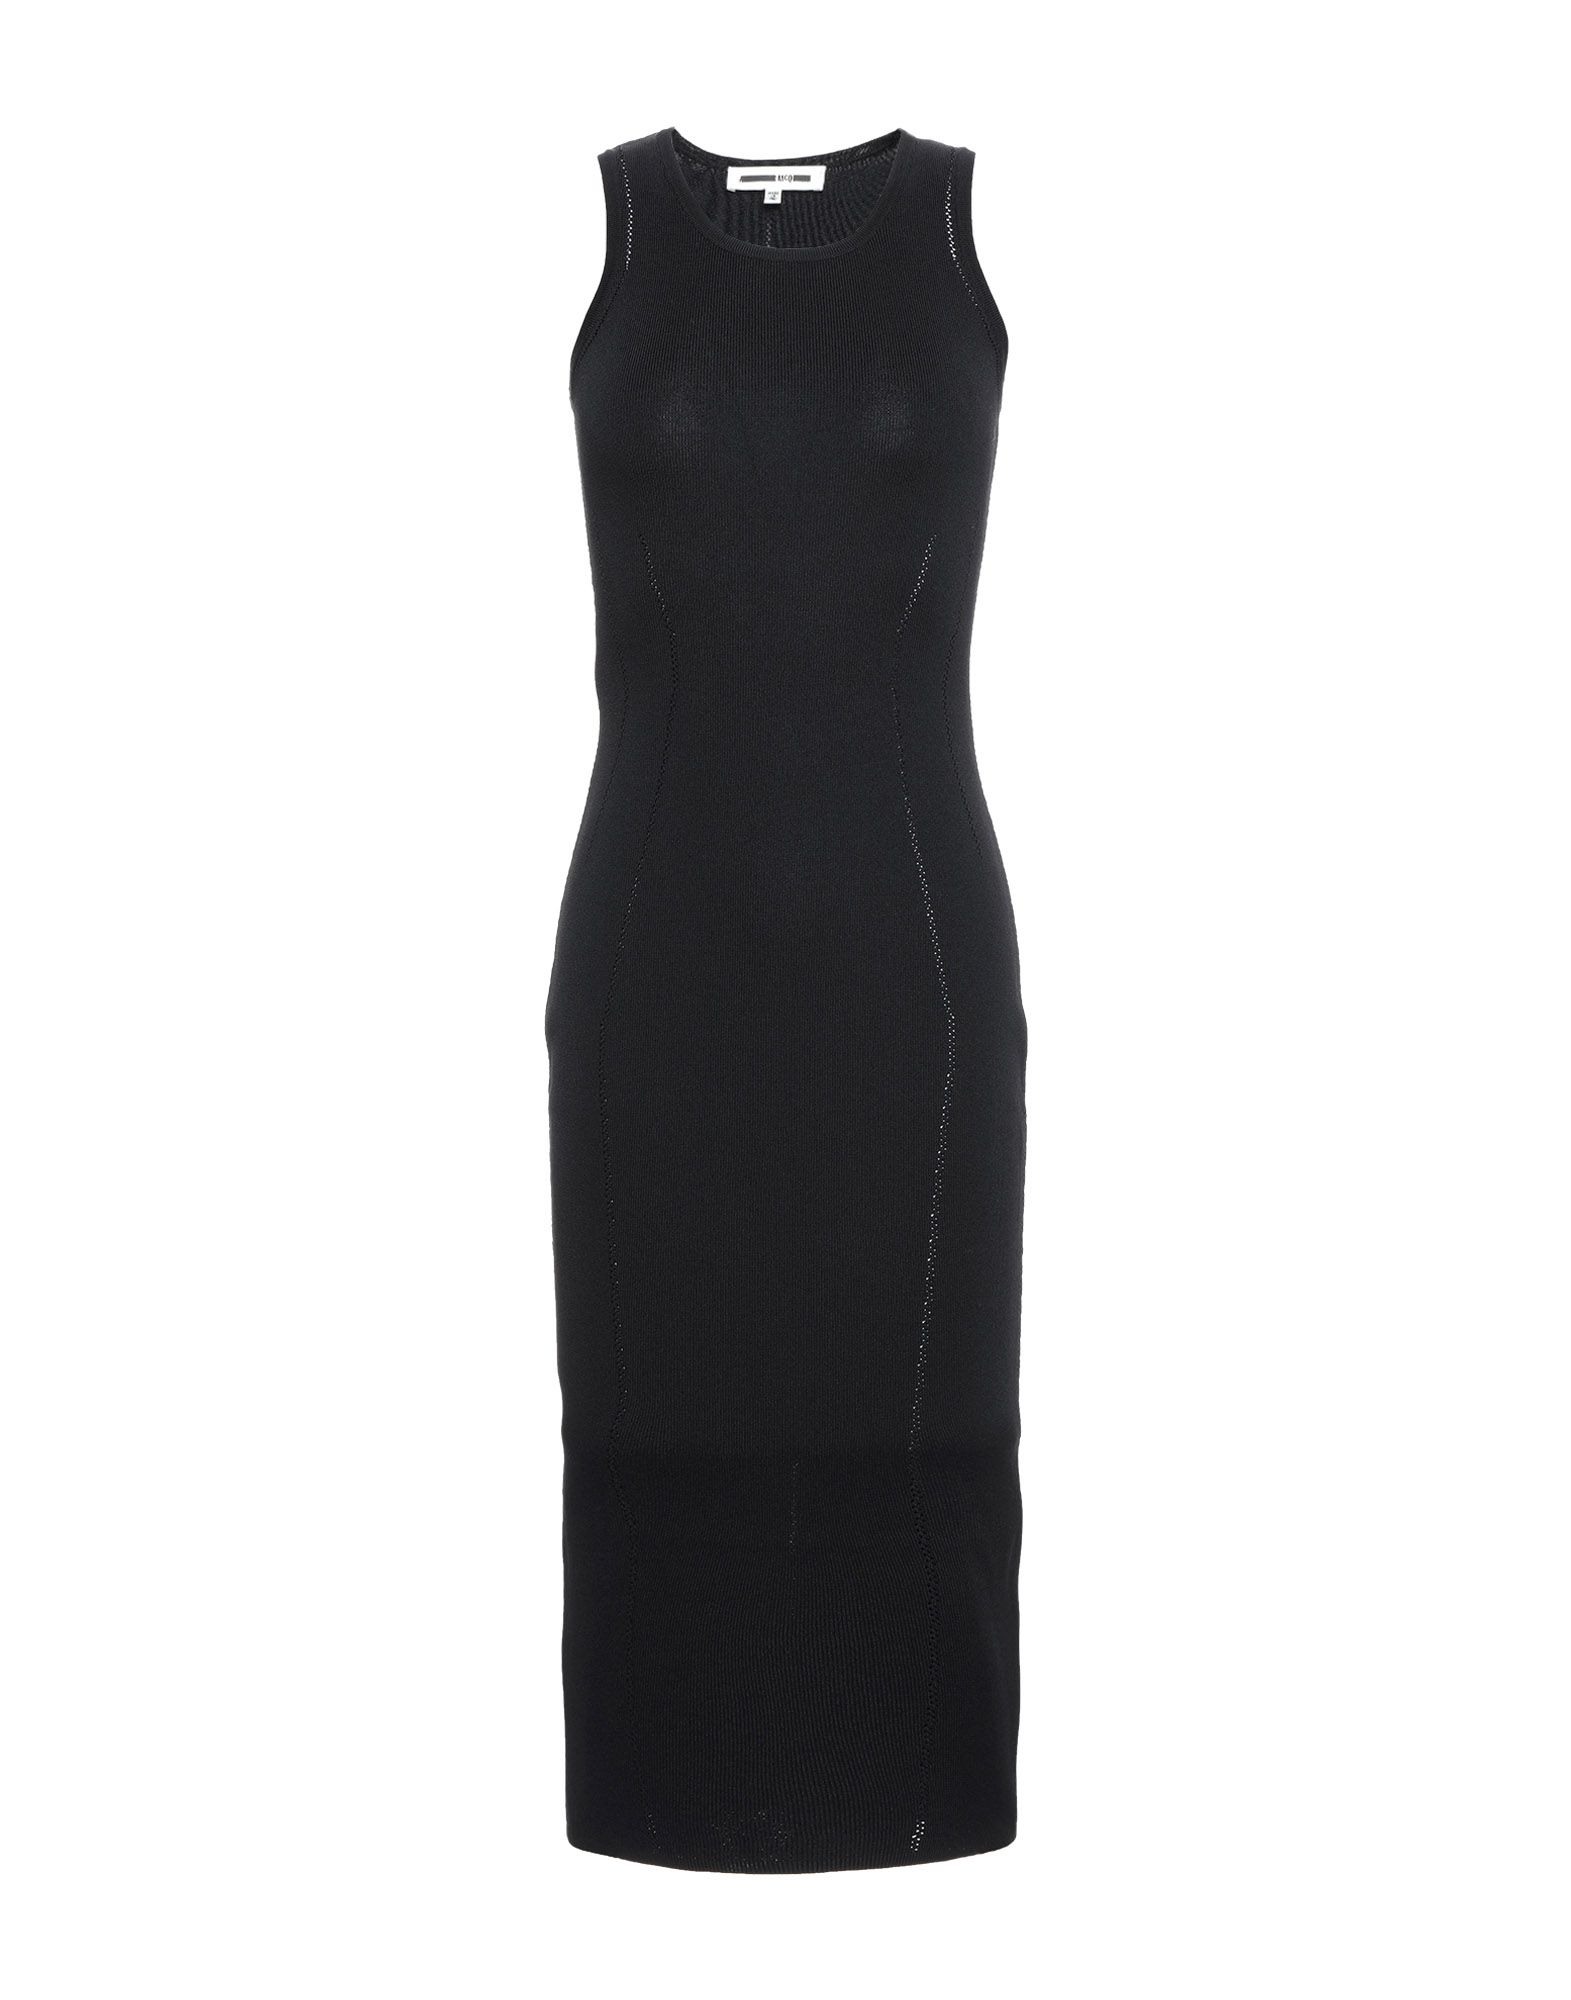 Фото - McQ Alexander McQueen Платье до колена mcq alexander mcqueen топ без рукавов